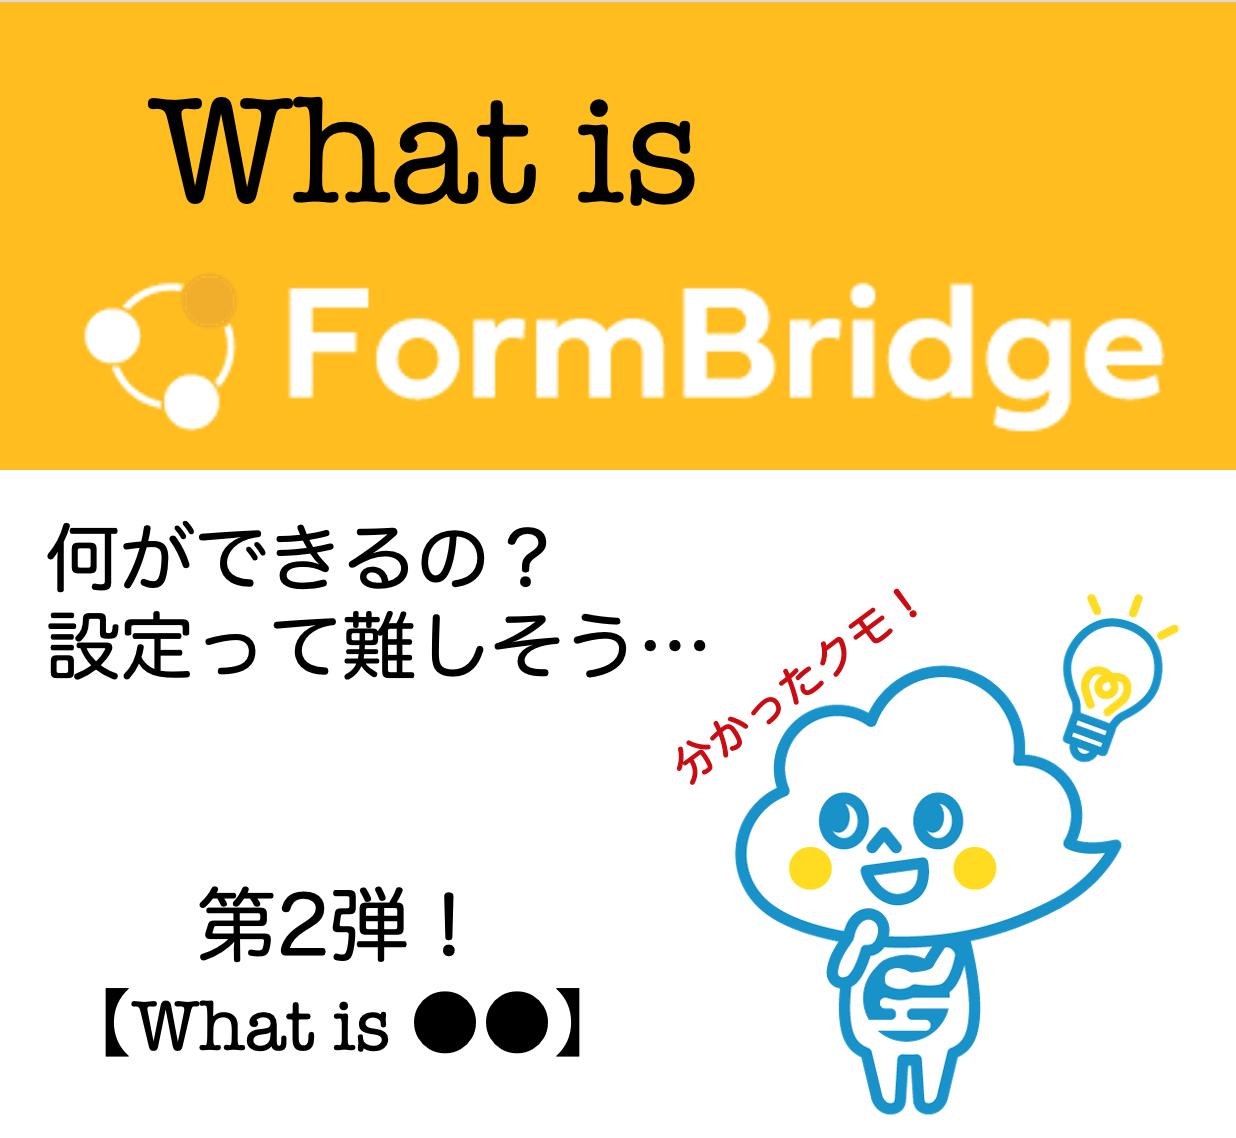 【kintoneでアンケート収集】webフォーム作成ツール・フォームブリッジってなに?